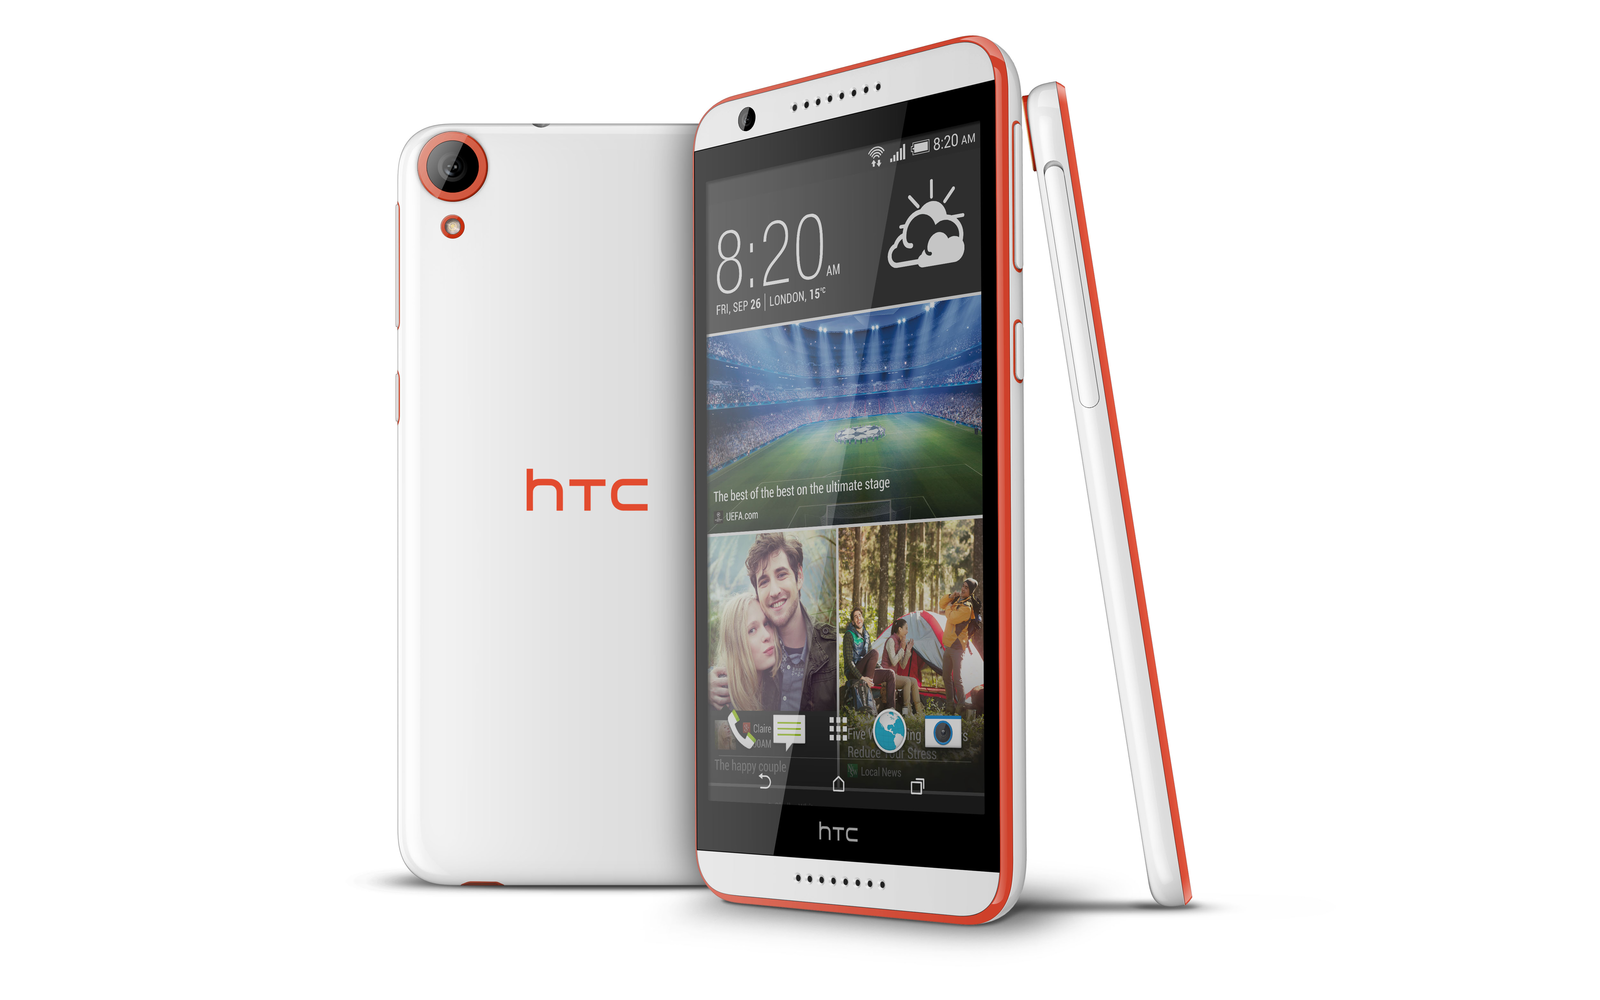 HTC-Desire-820_Tangerine-White.png